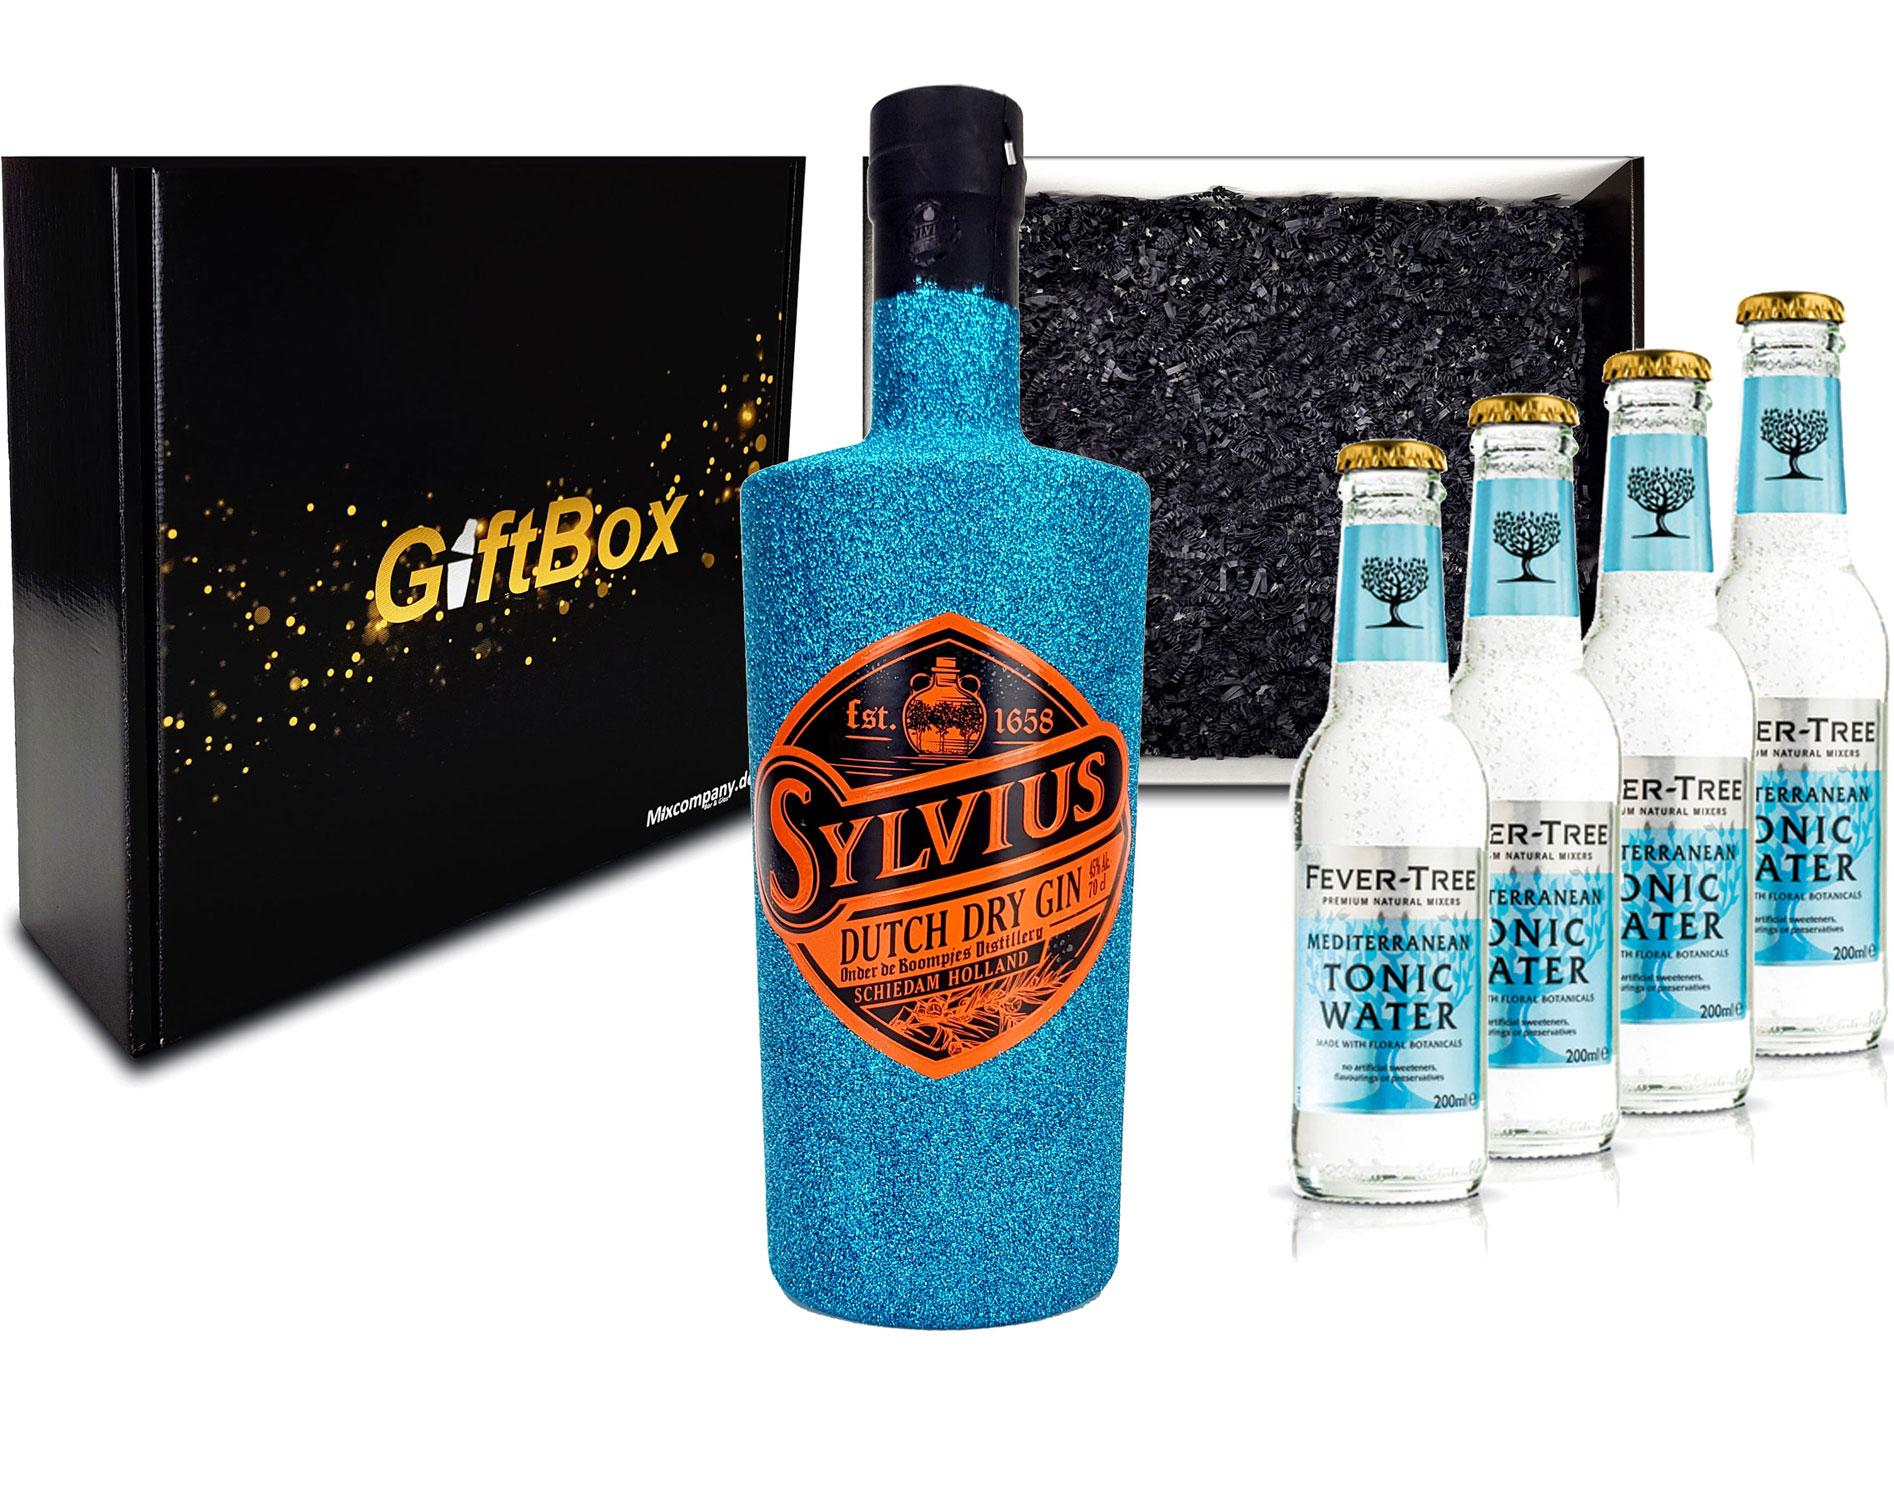 Gin Tonic Giftbox Geschenkset - Sylvius Dutch Gin Bling Bling Glitzerflasche Blau 0,7l 700ml (45% Vol) + 4x Fever Tree Mediterranean Tonic Water 200ml inkl. Pfand MEHRWEG - [Enthält Sulfite]